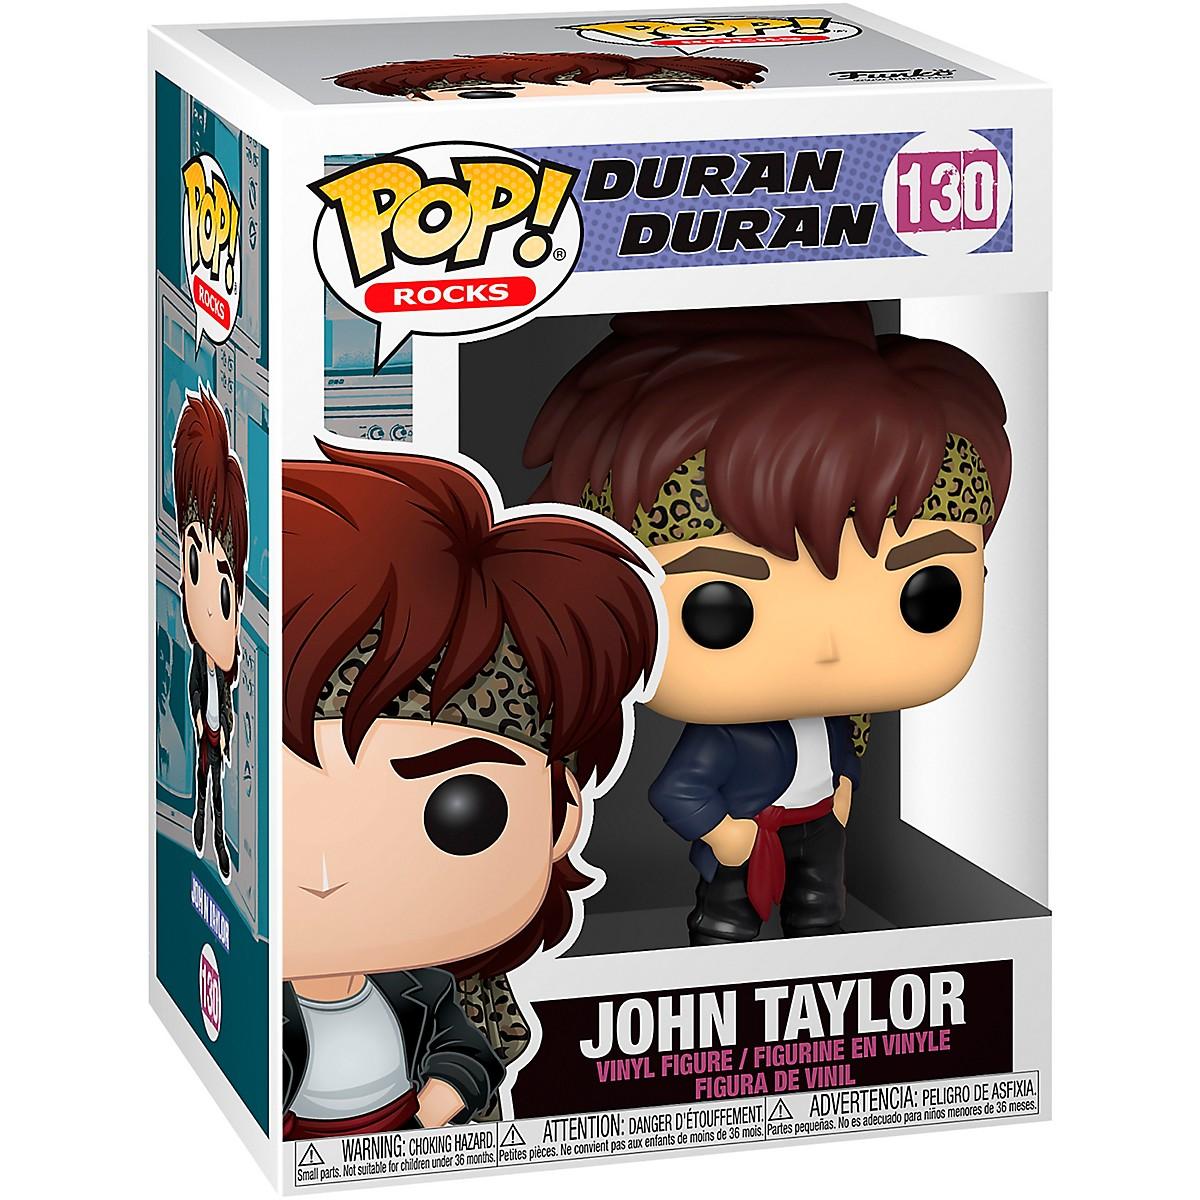 Funko Duran Duran POP! Rocks John Taylor Vinyl Figure #130